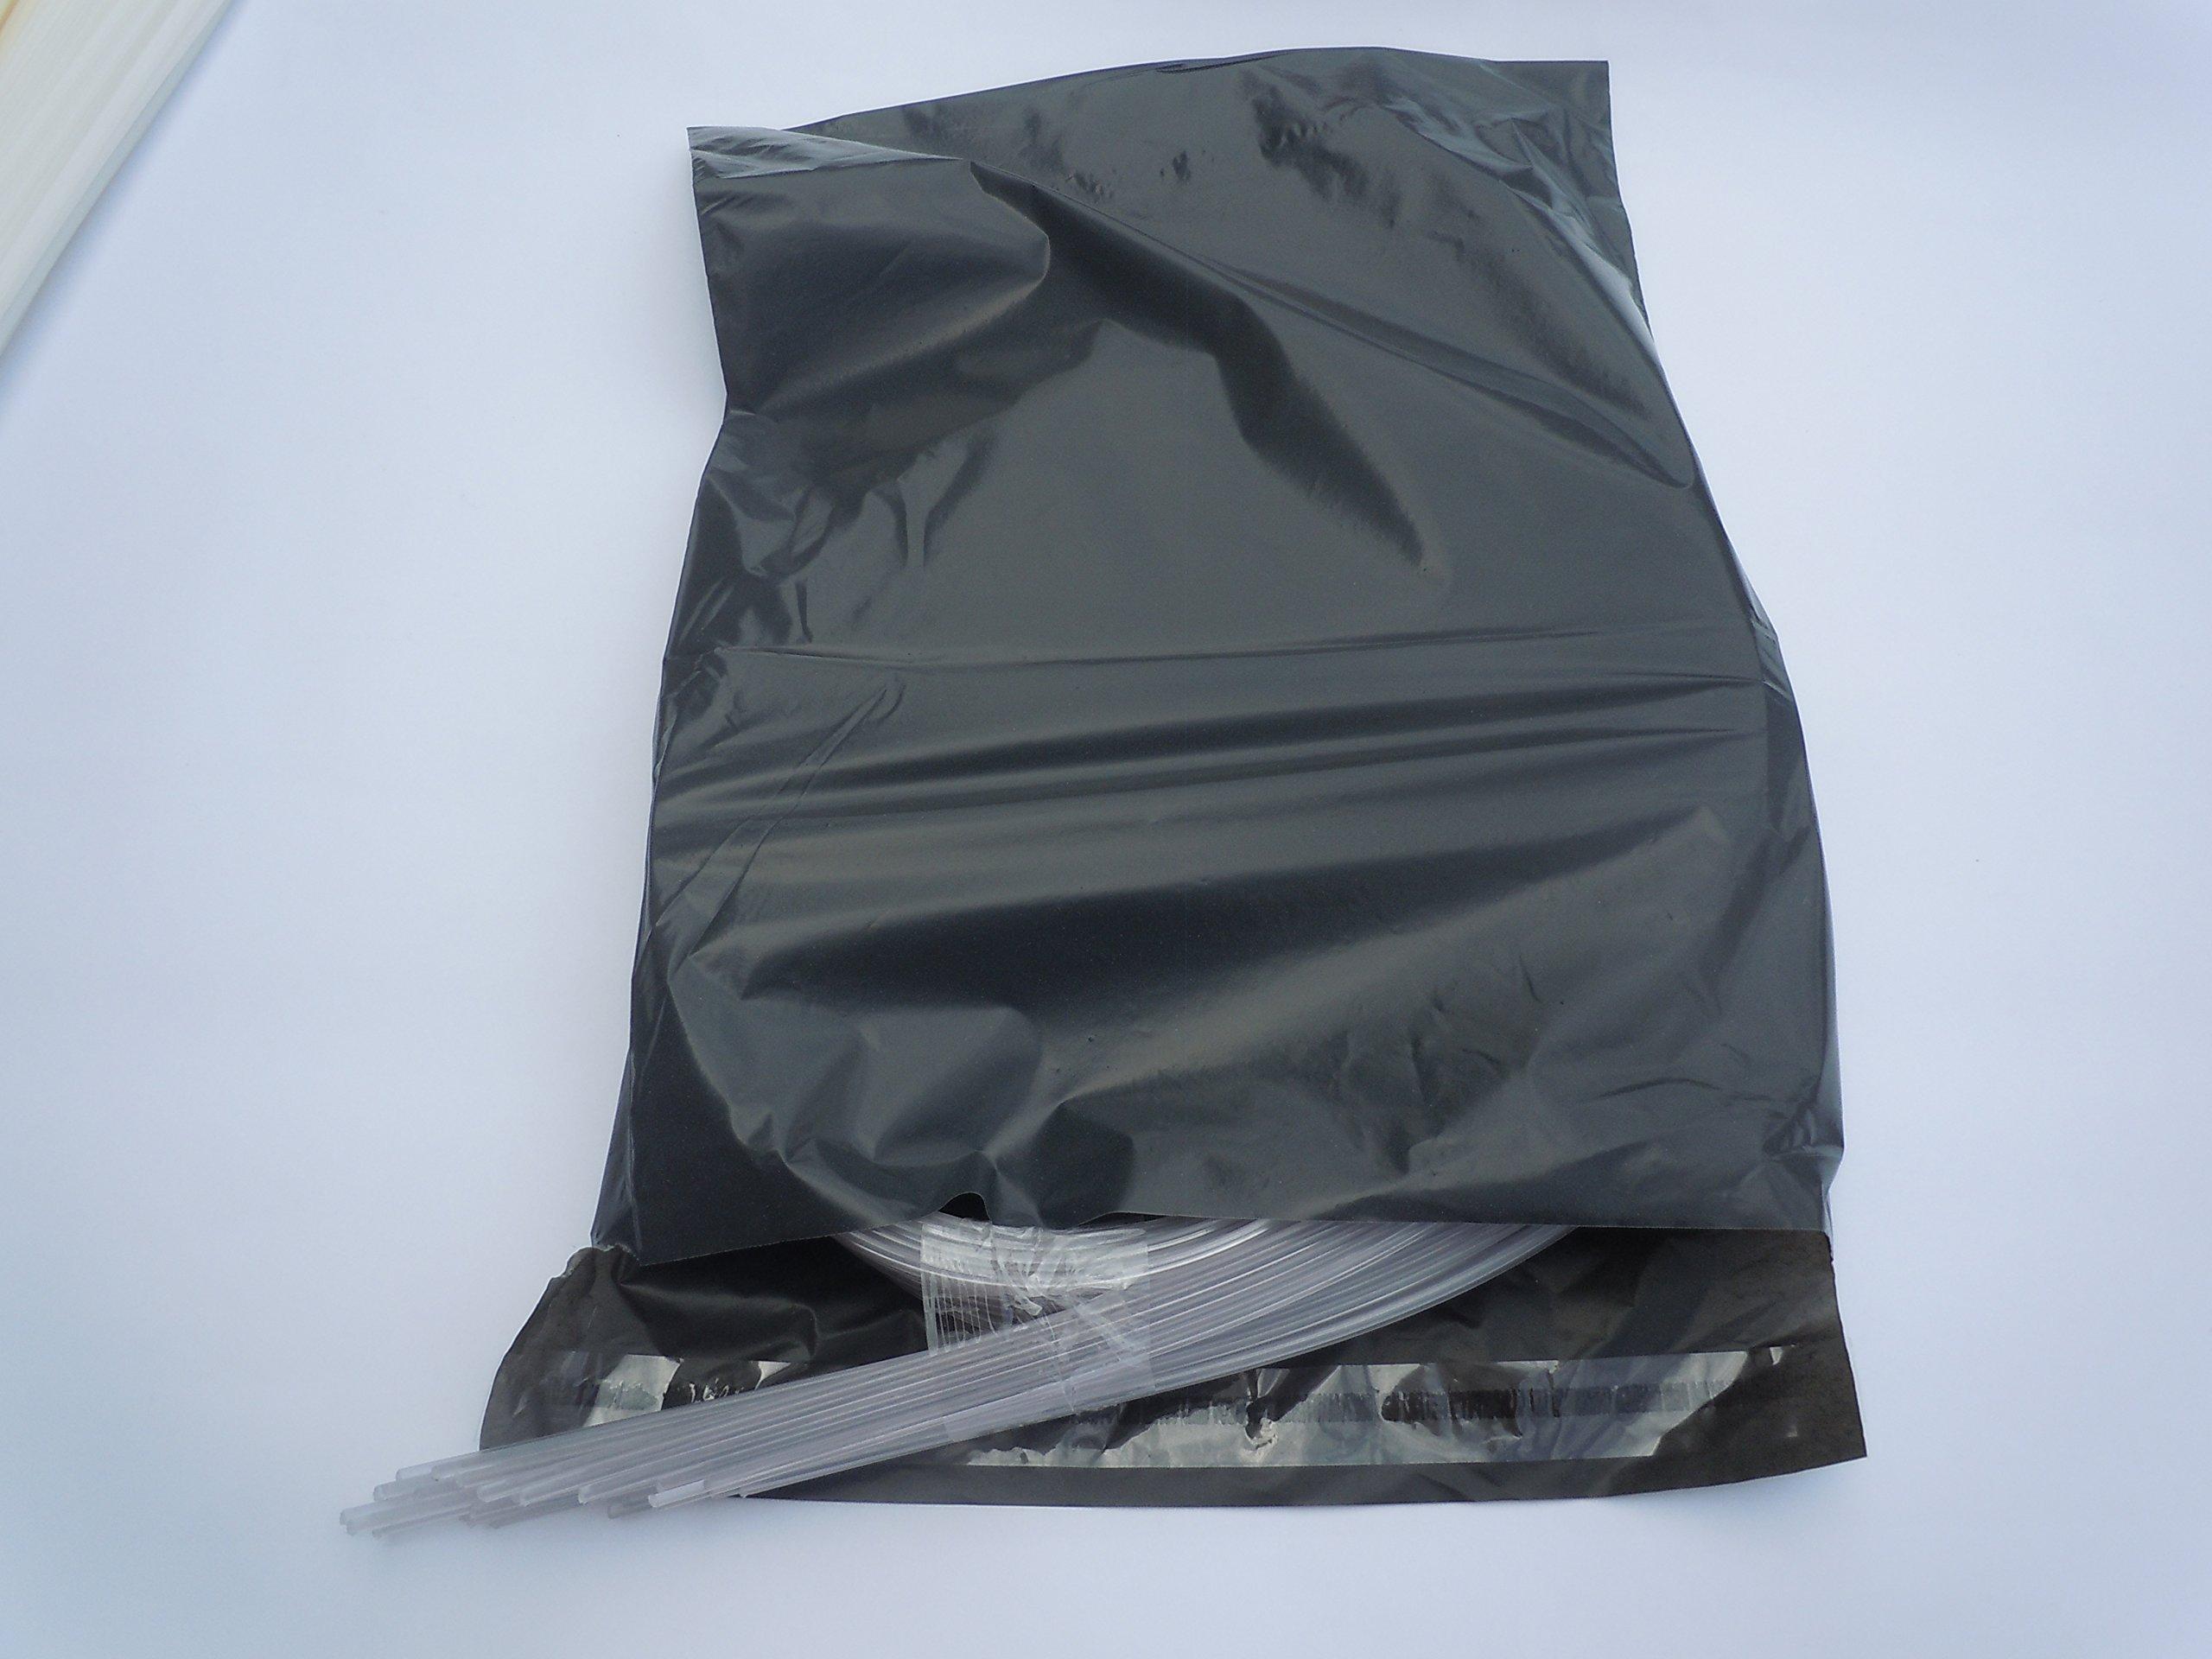 20pcs//lot 1pcs=1m PP ABS PE PVC PPR plastic welding rod car pipe plastic sheet welding grey white black beige transparent Transporter-Galaxy